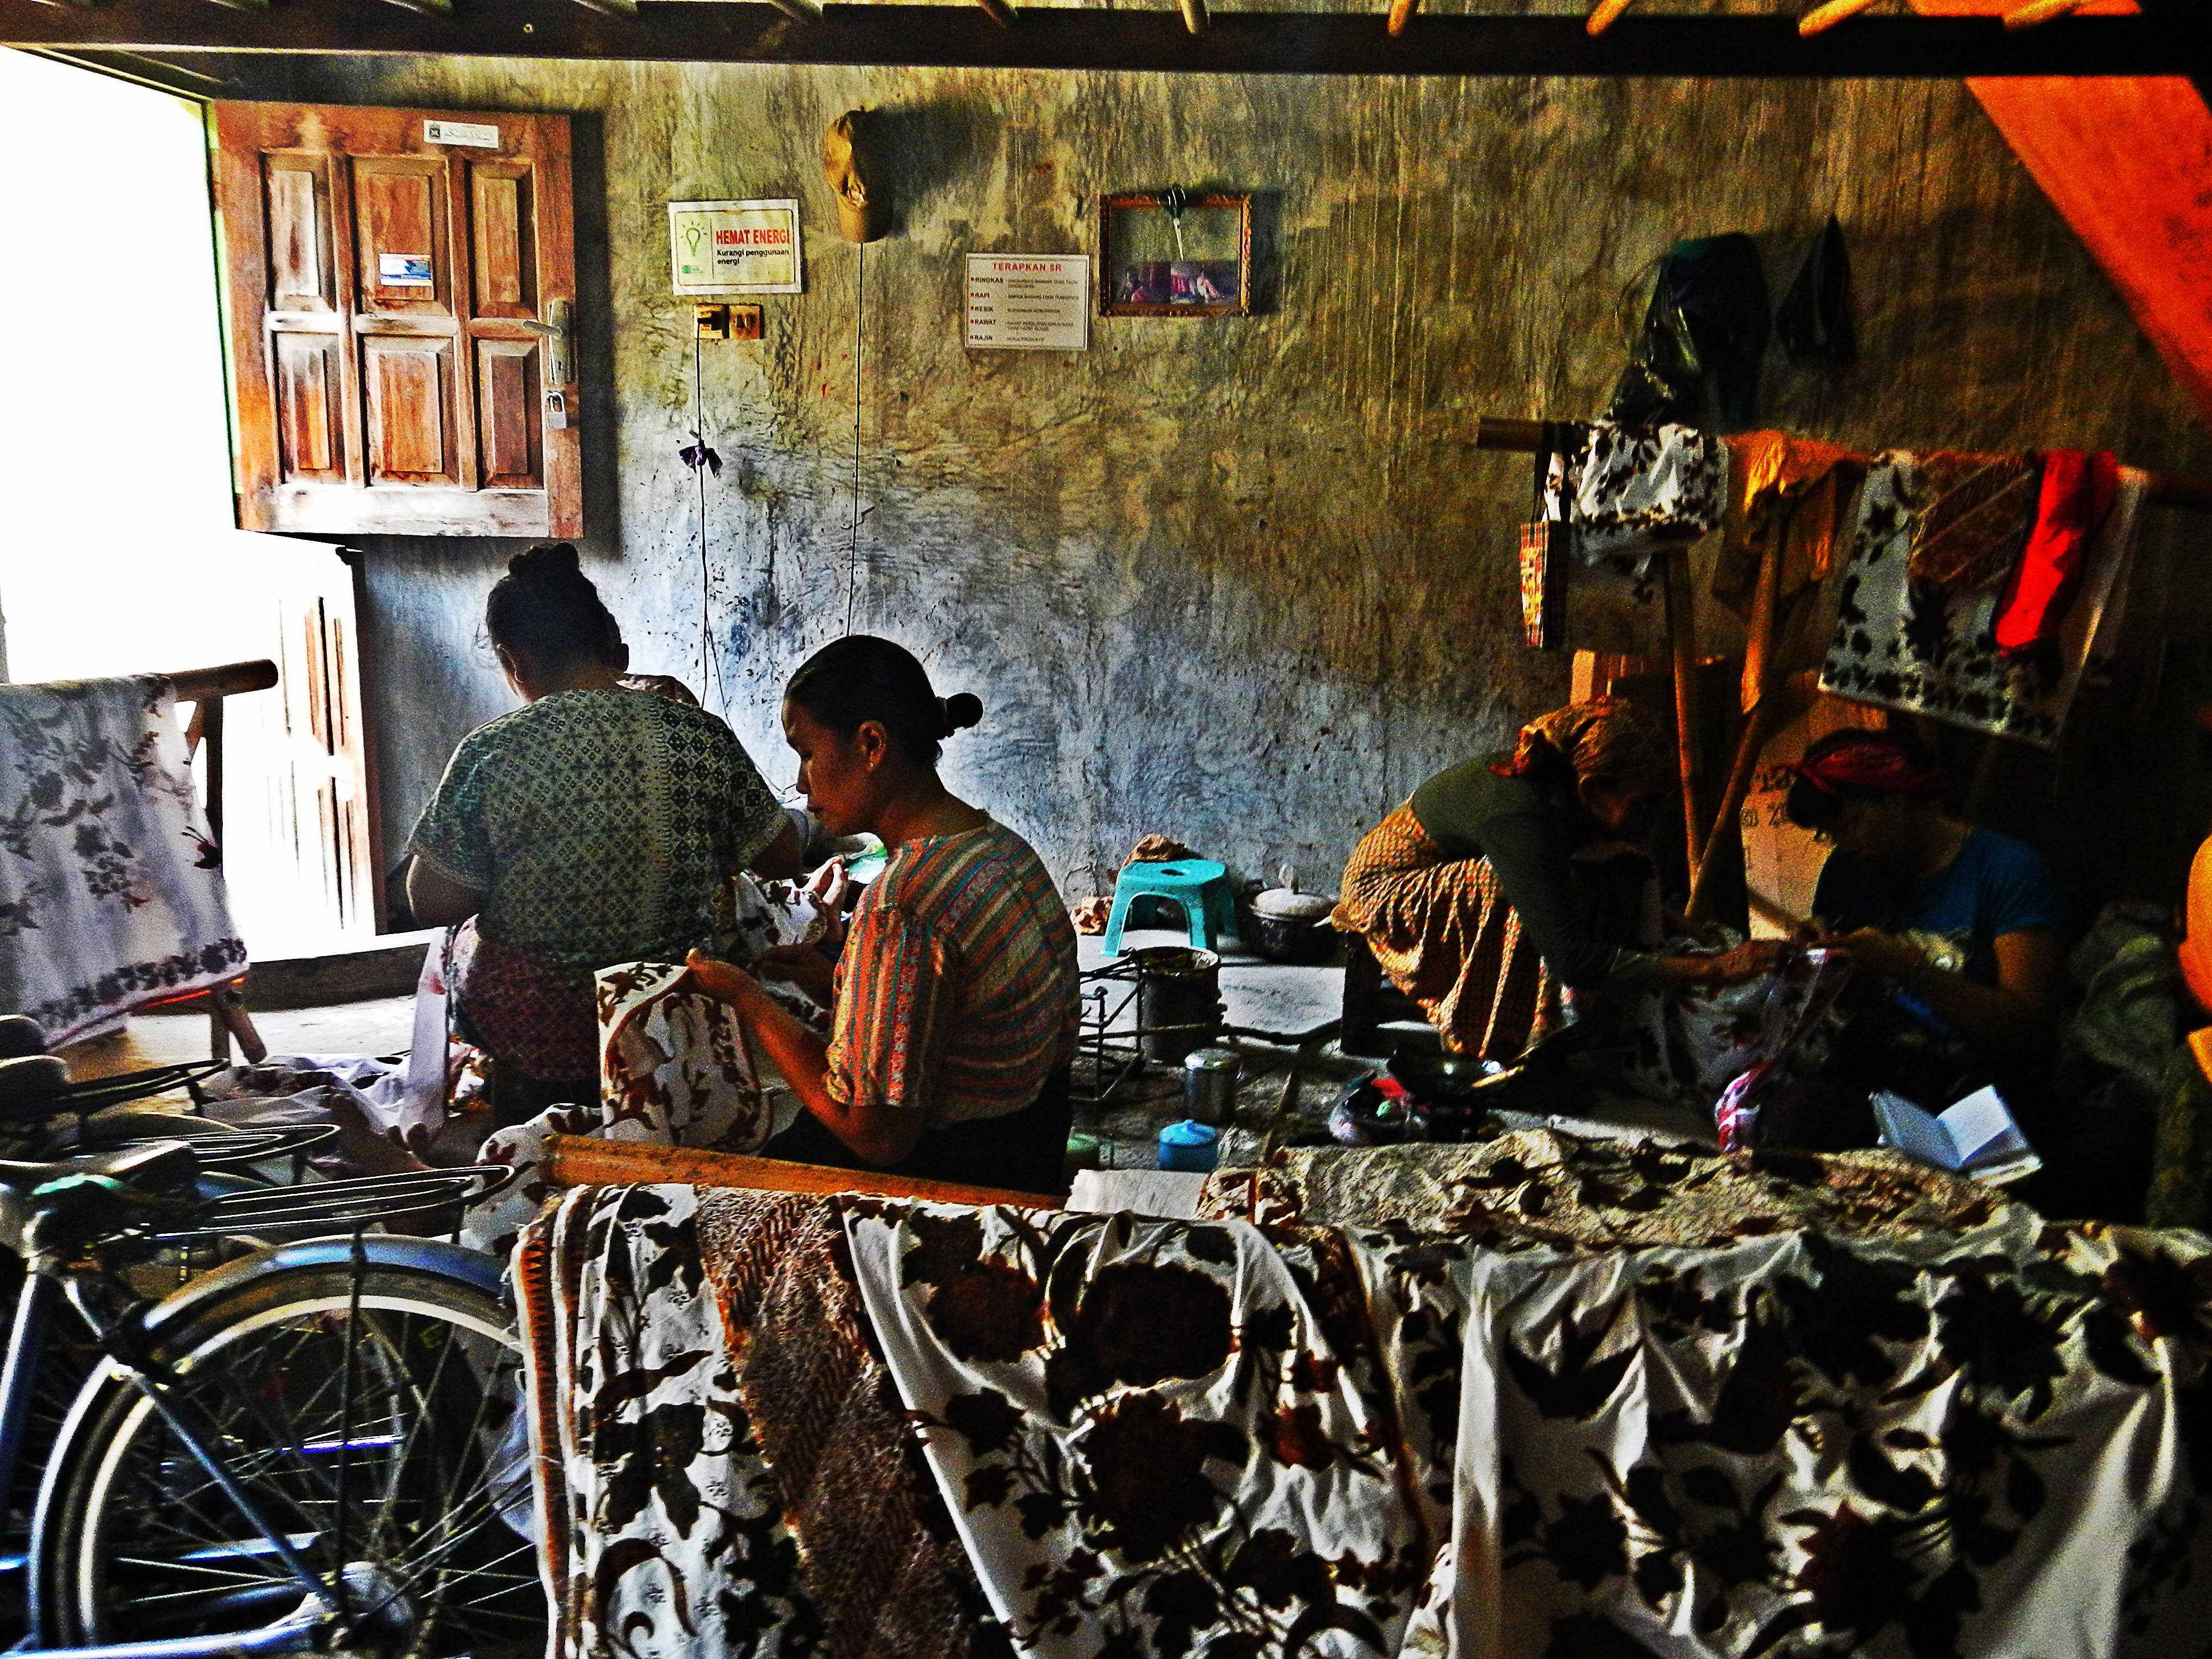 Wisata Sragen Wajib Dikunjungi Tanahnusantara Desa Kliwonan Salah Satu Kawasan